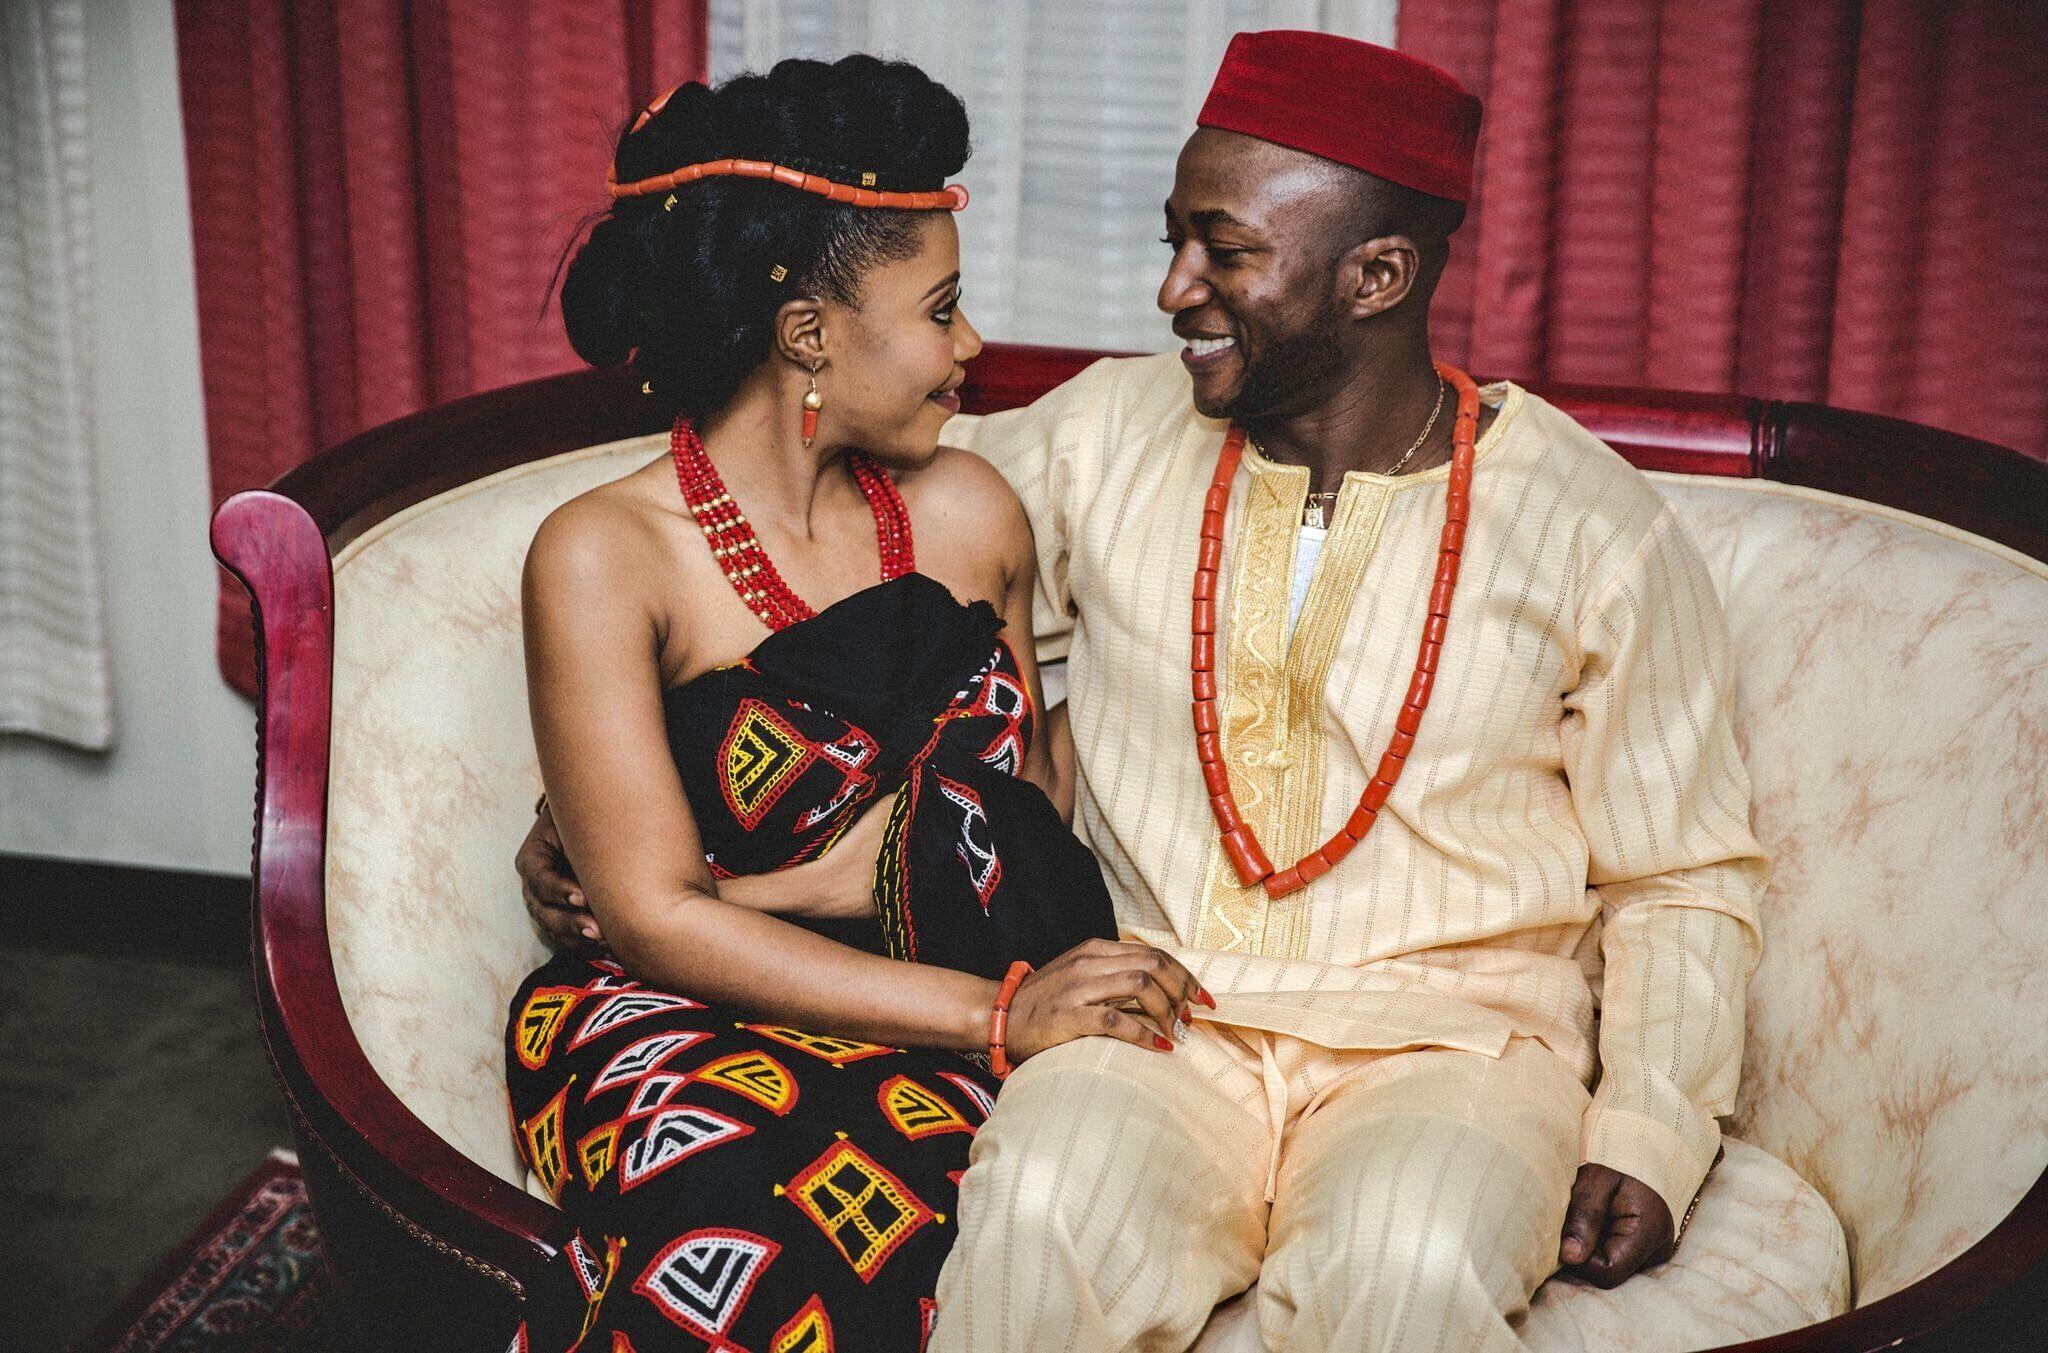 Cameroon traditional wedding, Cameroon attire, Bamenda wear, African attire, traditional wedding